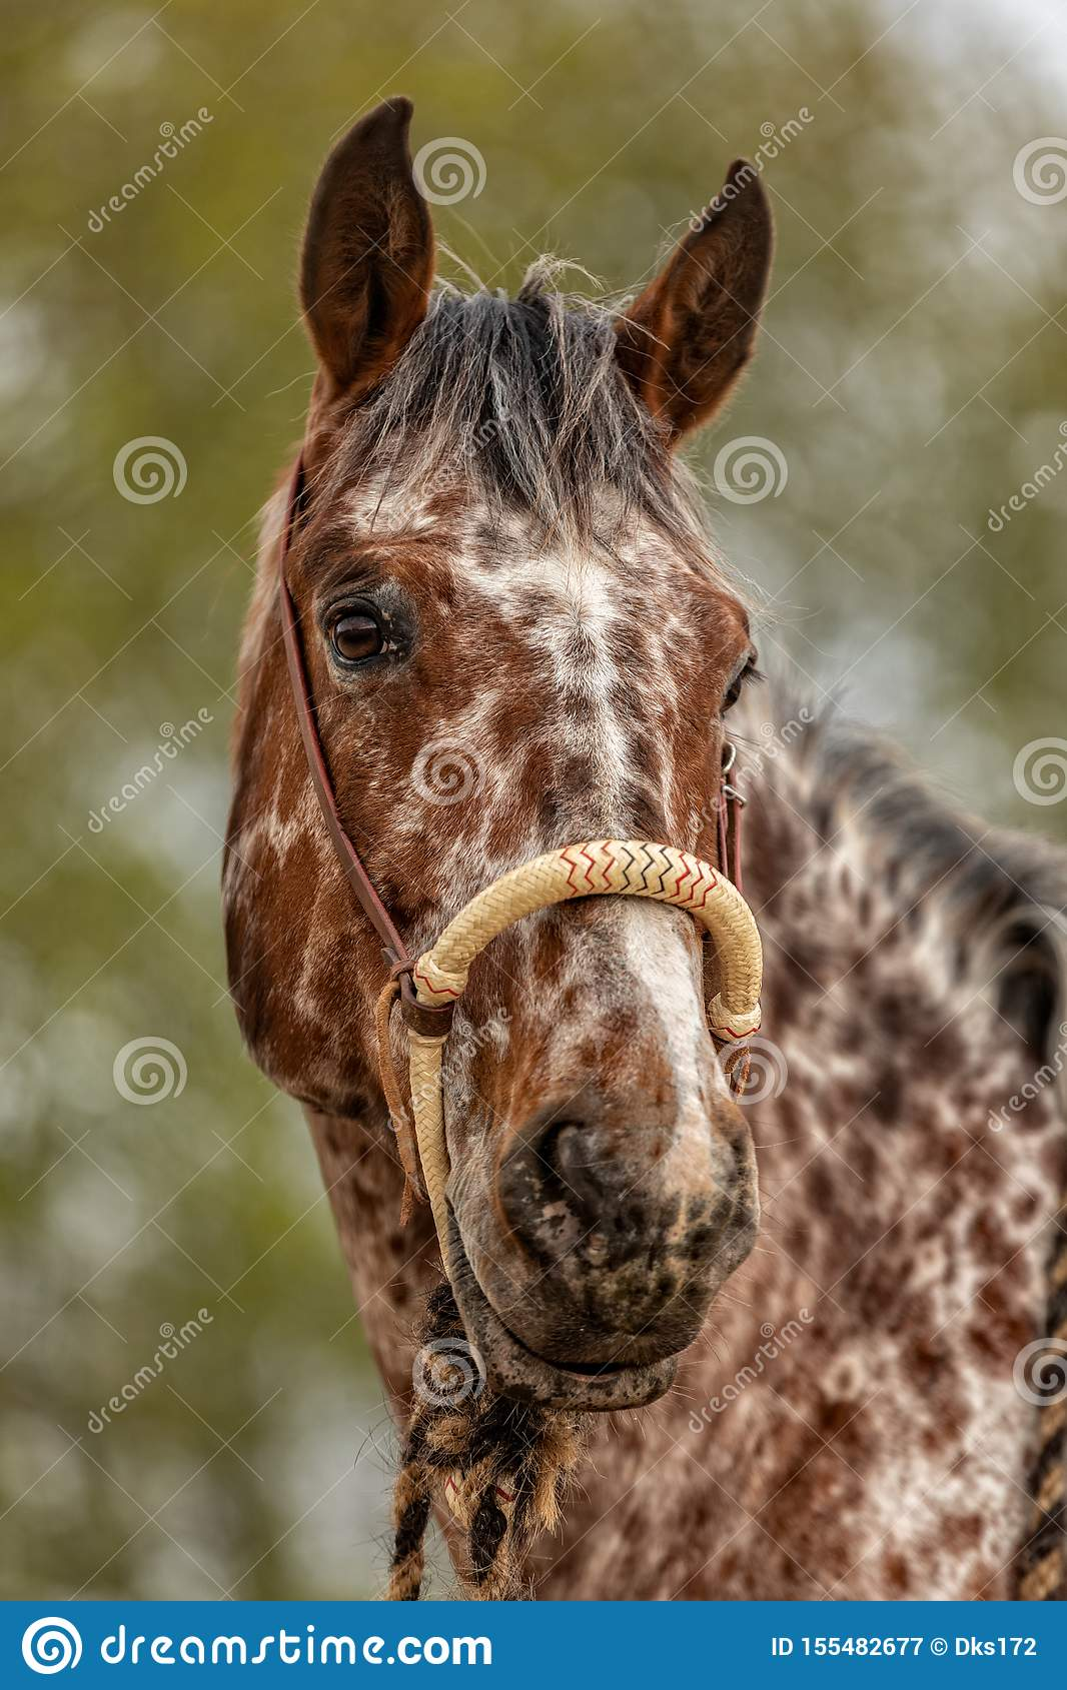 603 Appaloosa Stallion Photos Free Royalty Free Stock Photos From Dreamstime